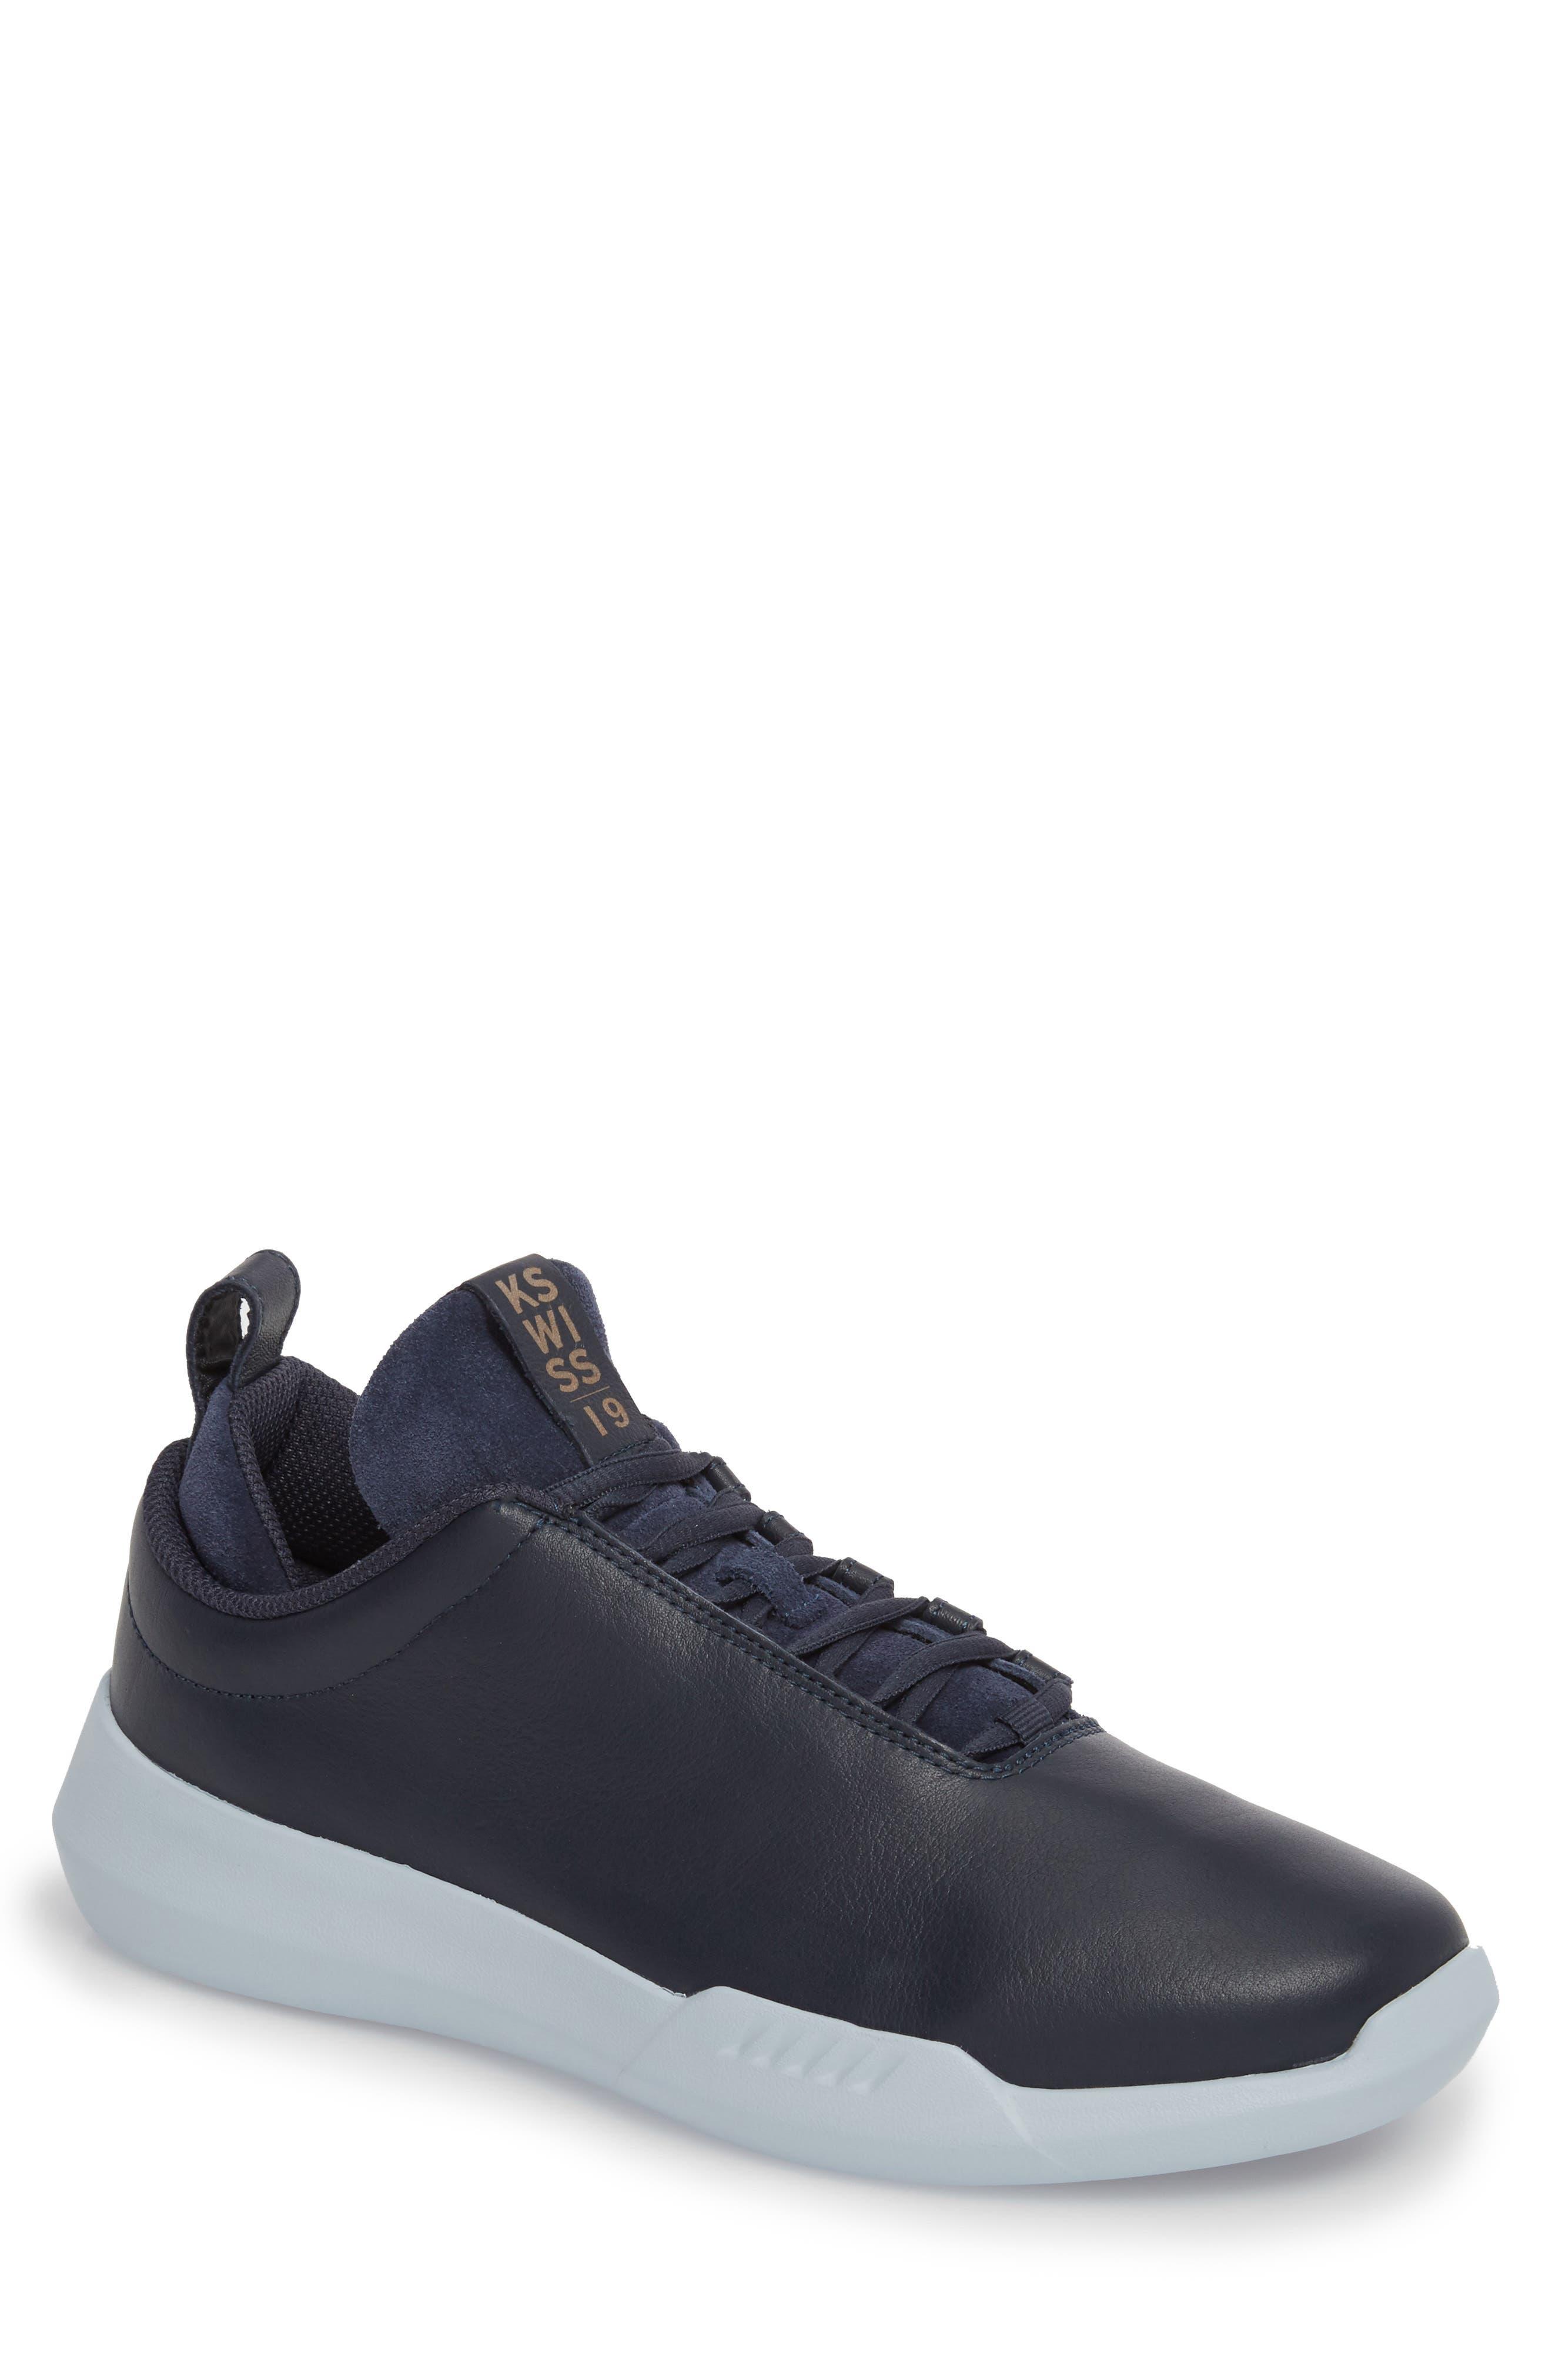 Gen-K Icon Sneaker,                         Main,                         color, NAVY/CELESTIAL BLUE